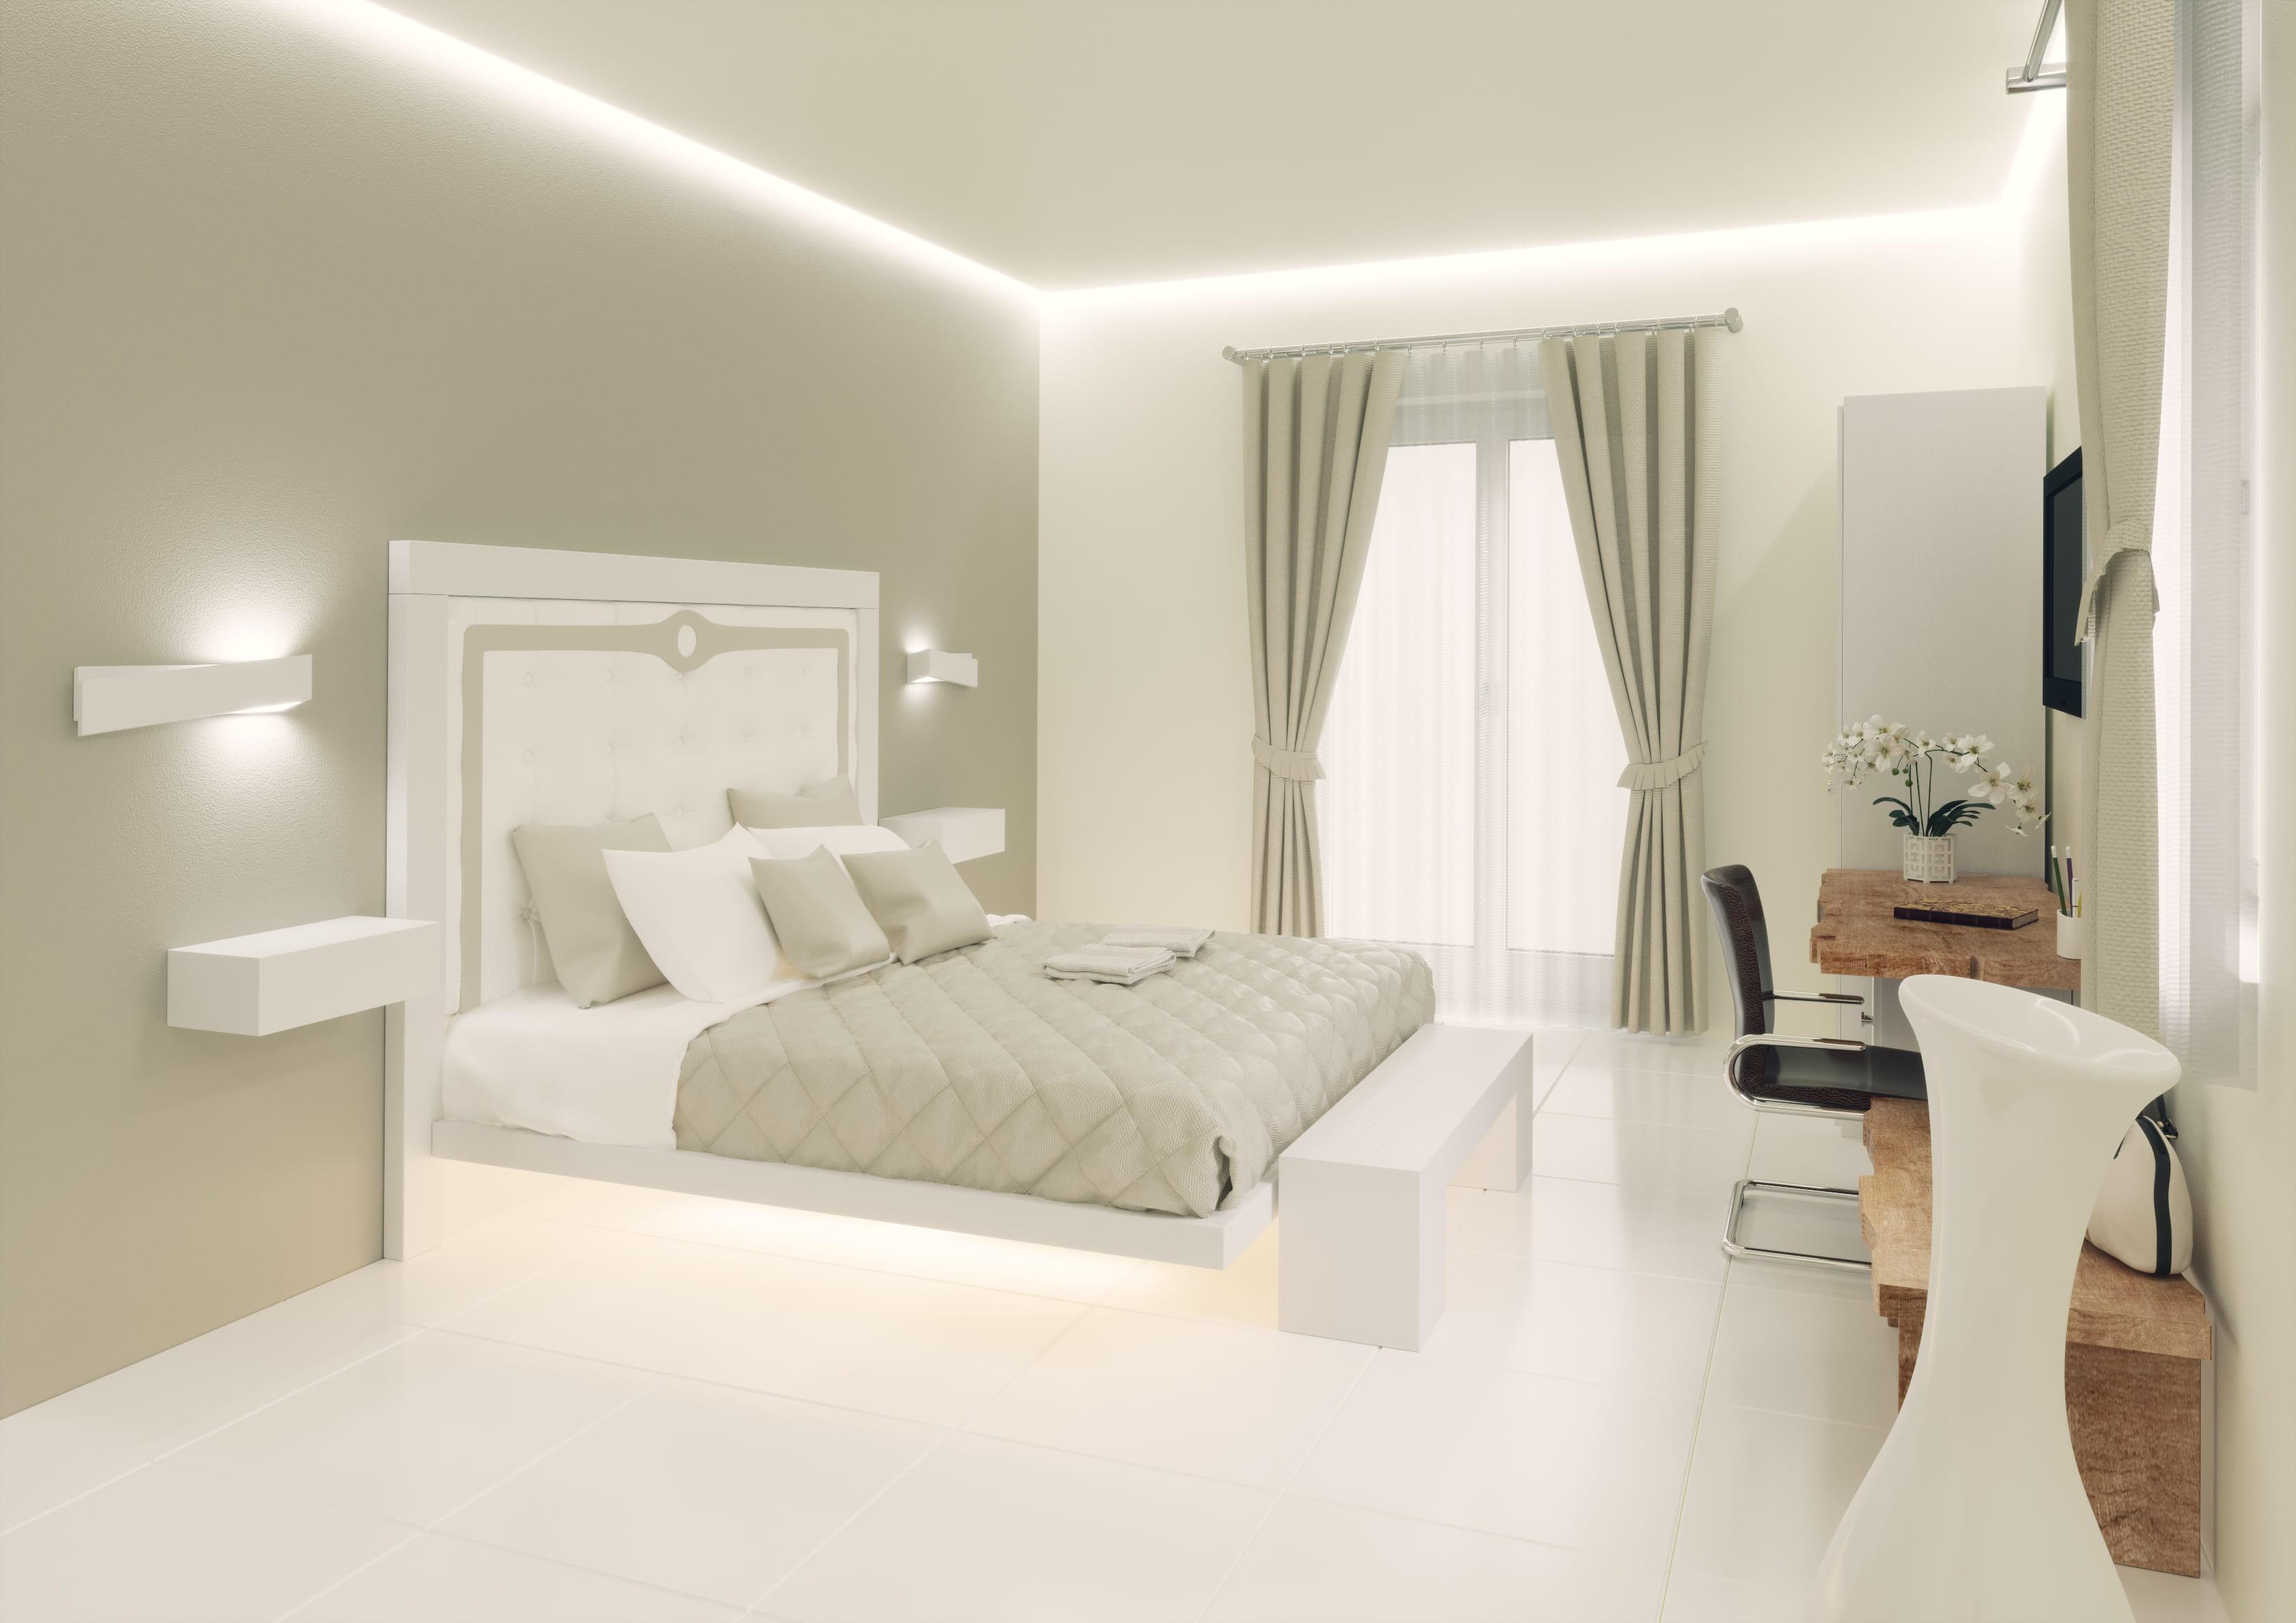 stefanomimmocchirendering lavori portfolio rendering arredo hotel